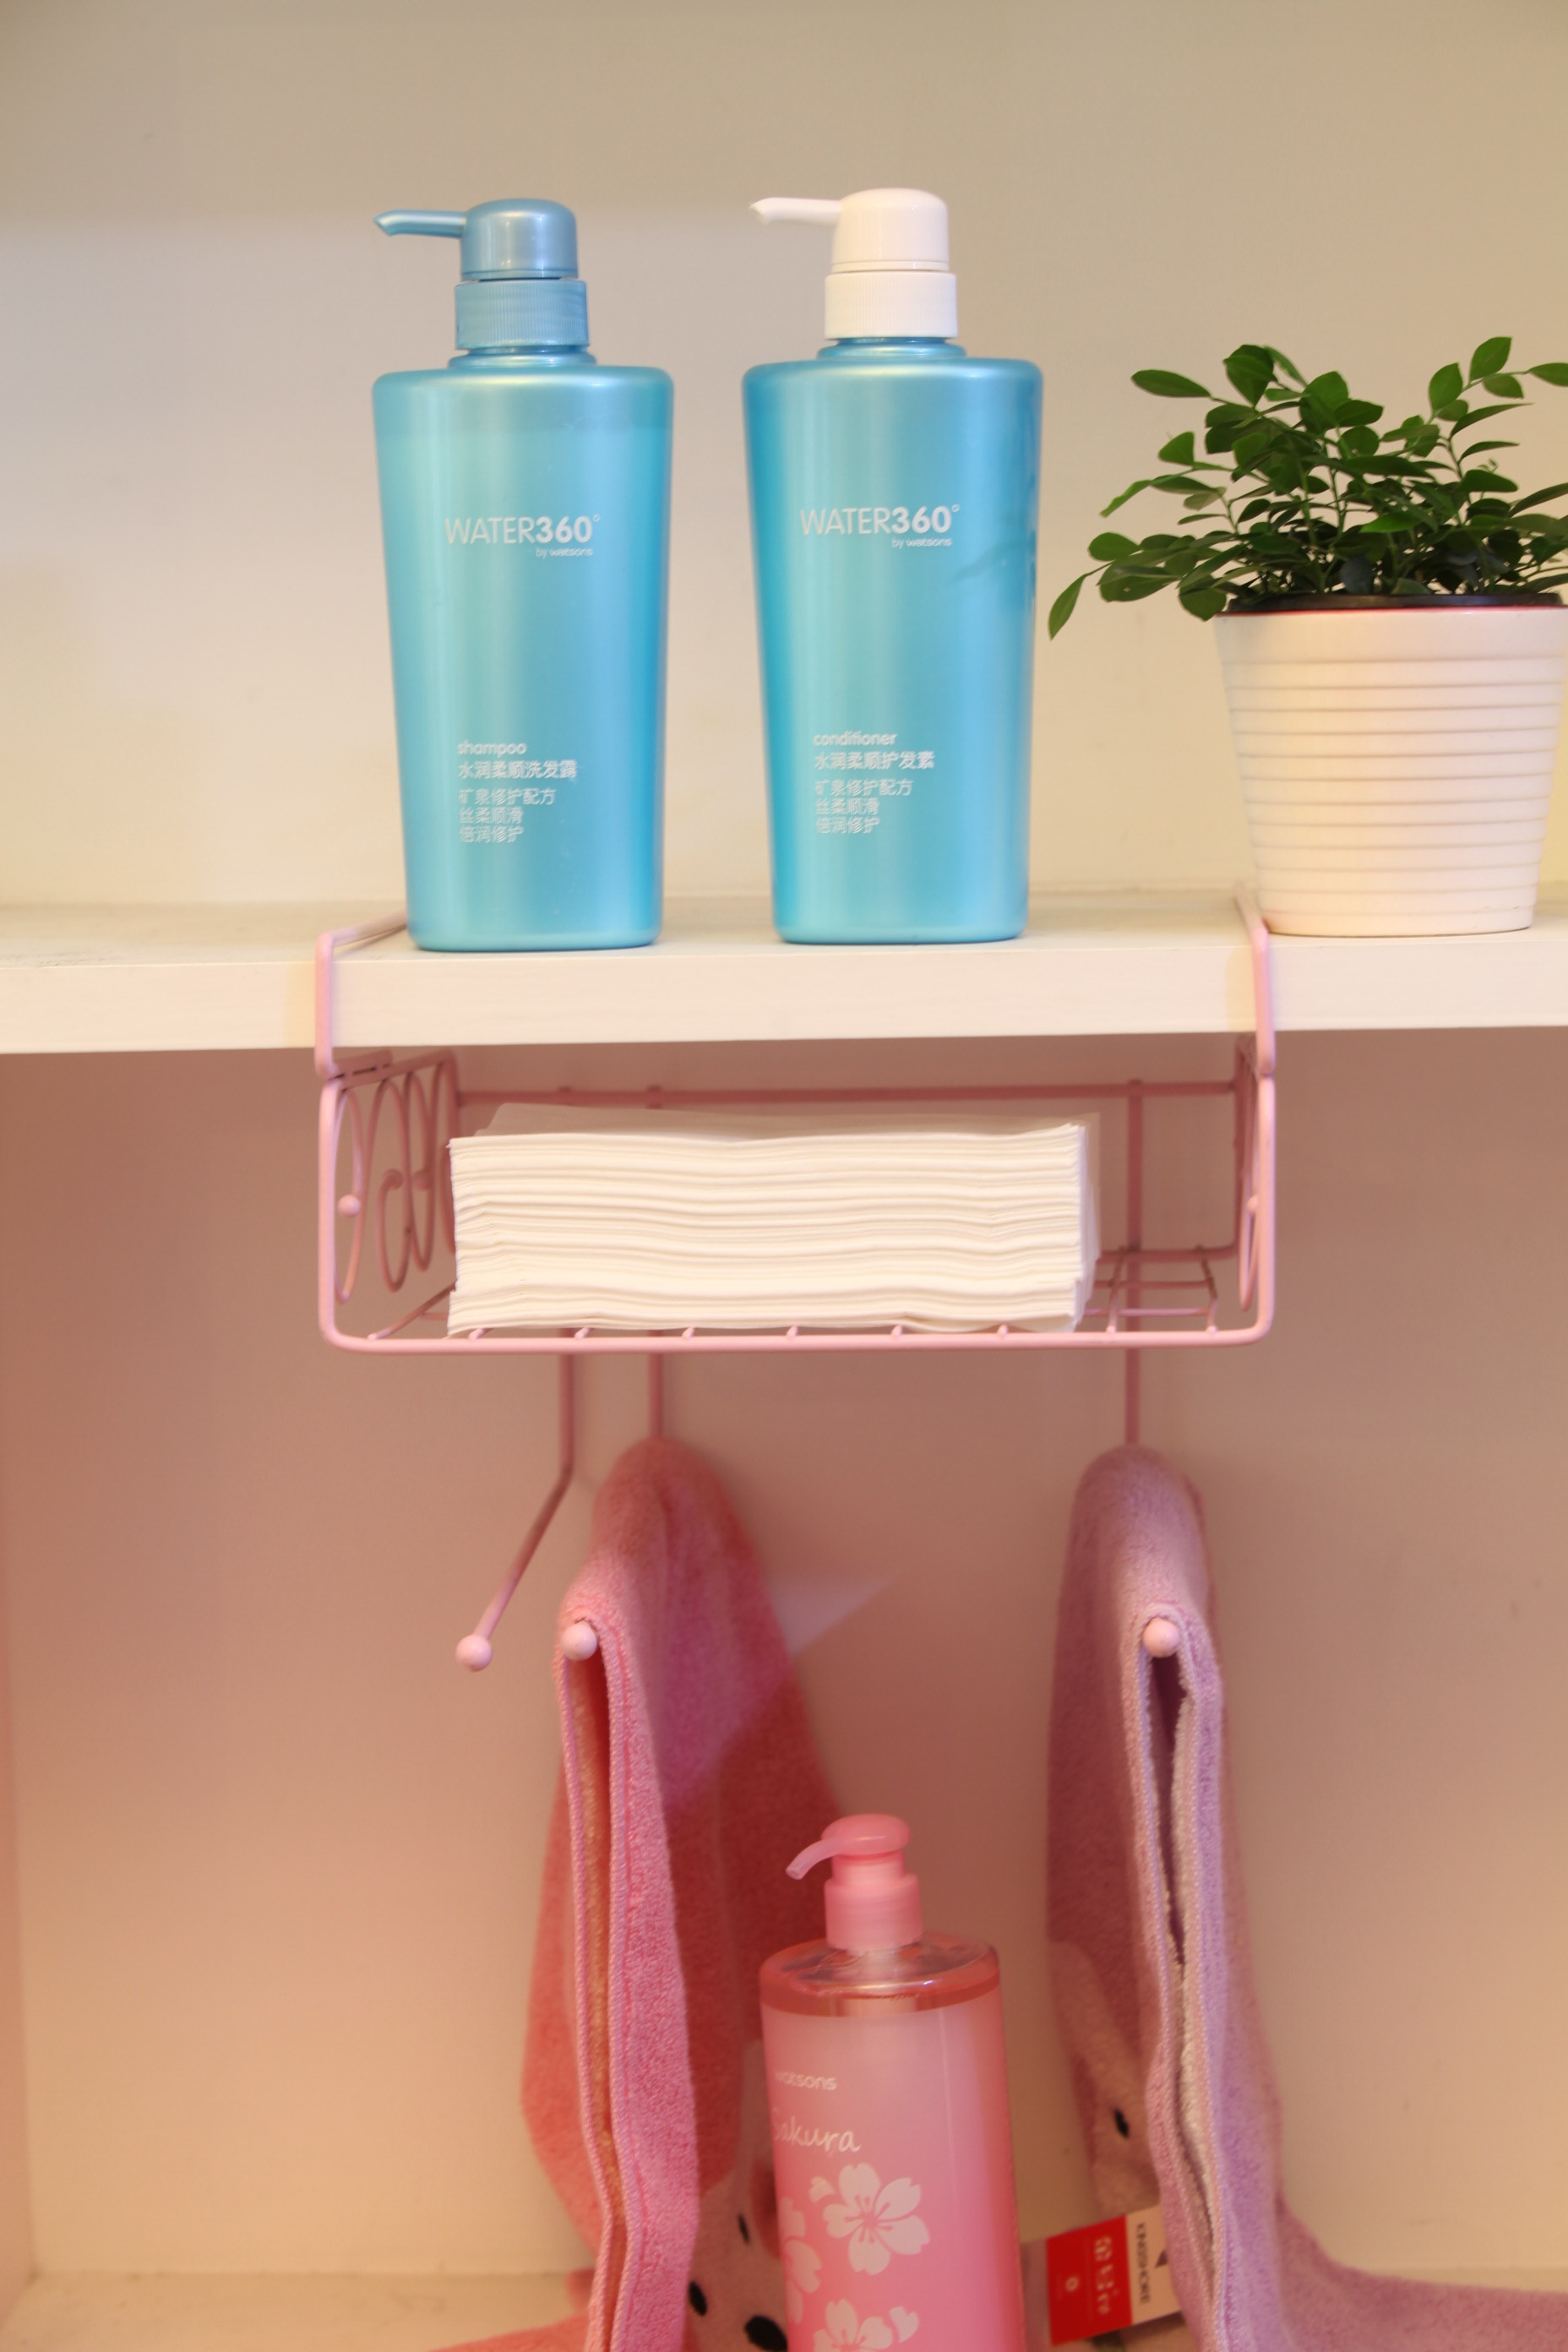 Towel Rack, Bathroom Rack, Bedroom Cabinet Towel Holder,